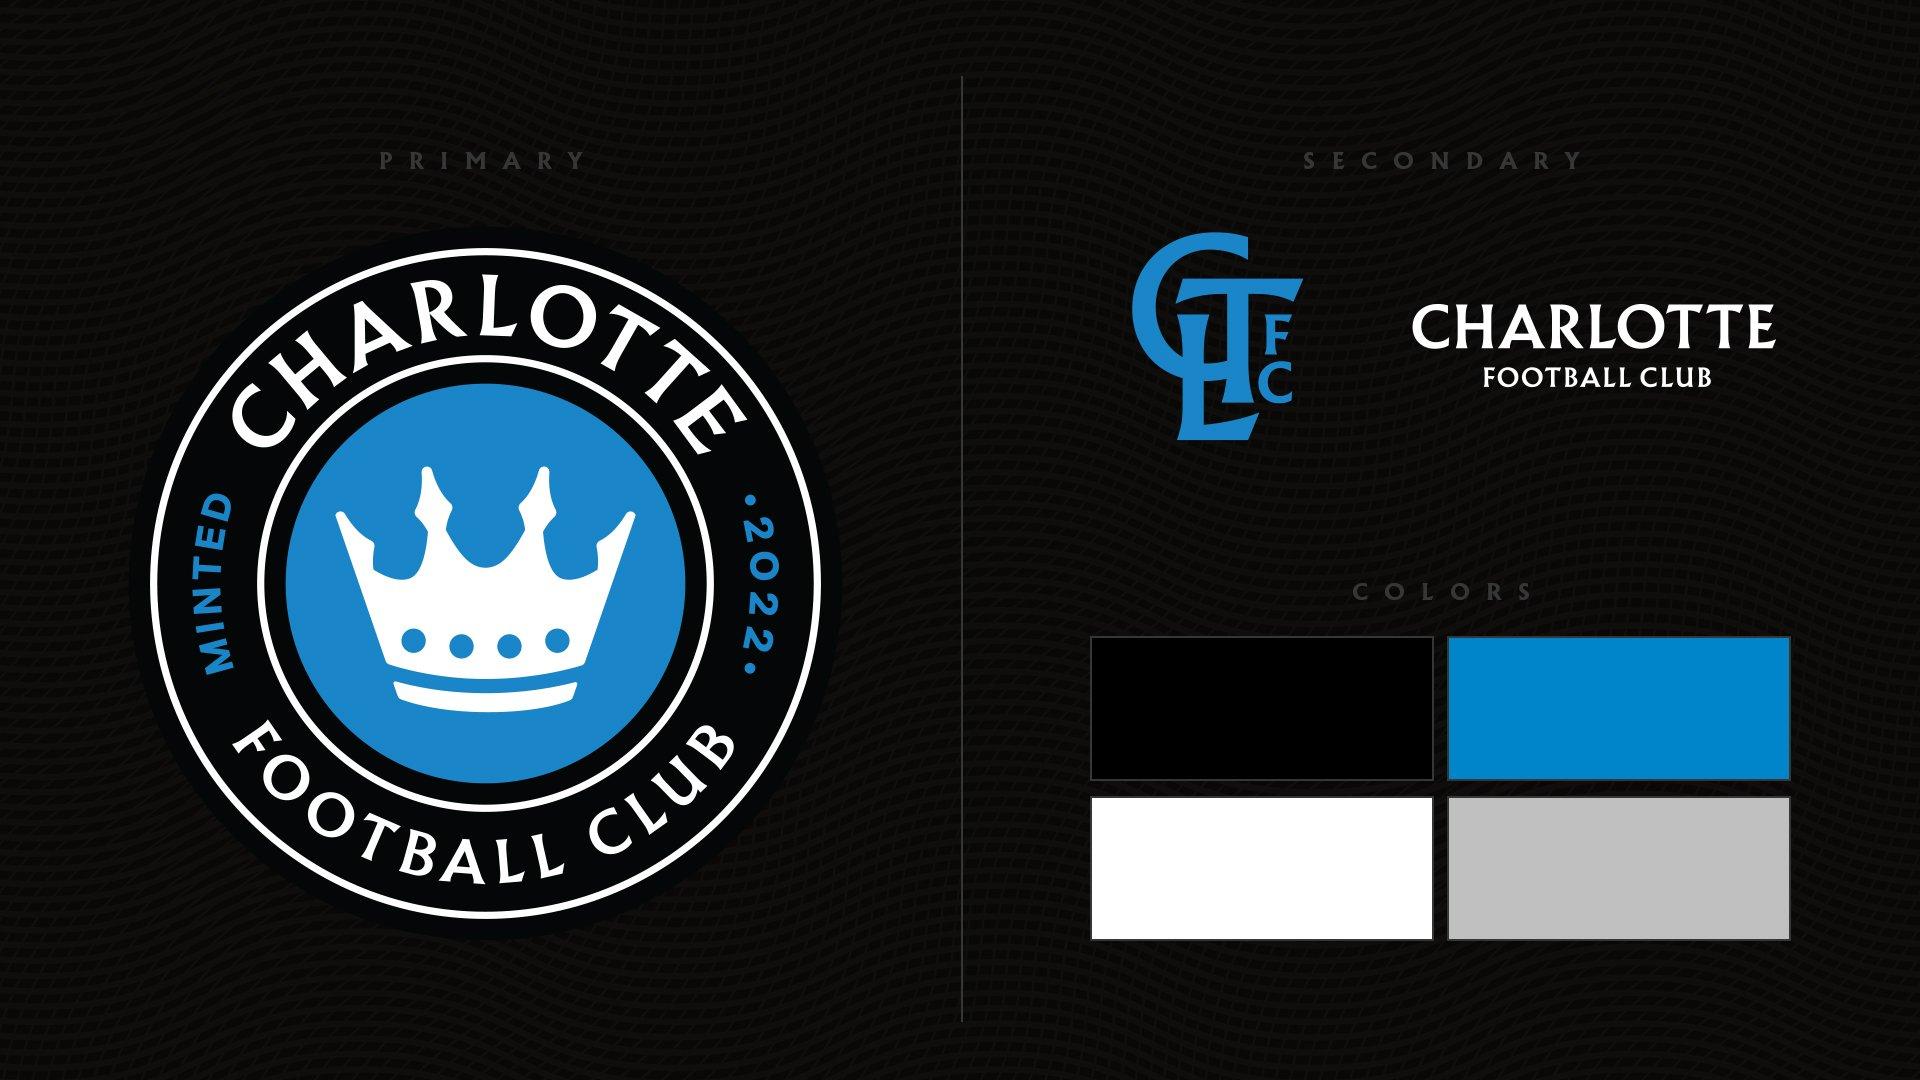 Logos y colores del Charlotte Football Club | Imagen Twitter Oficial